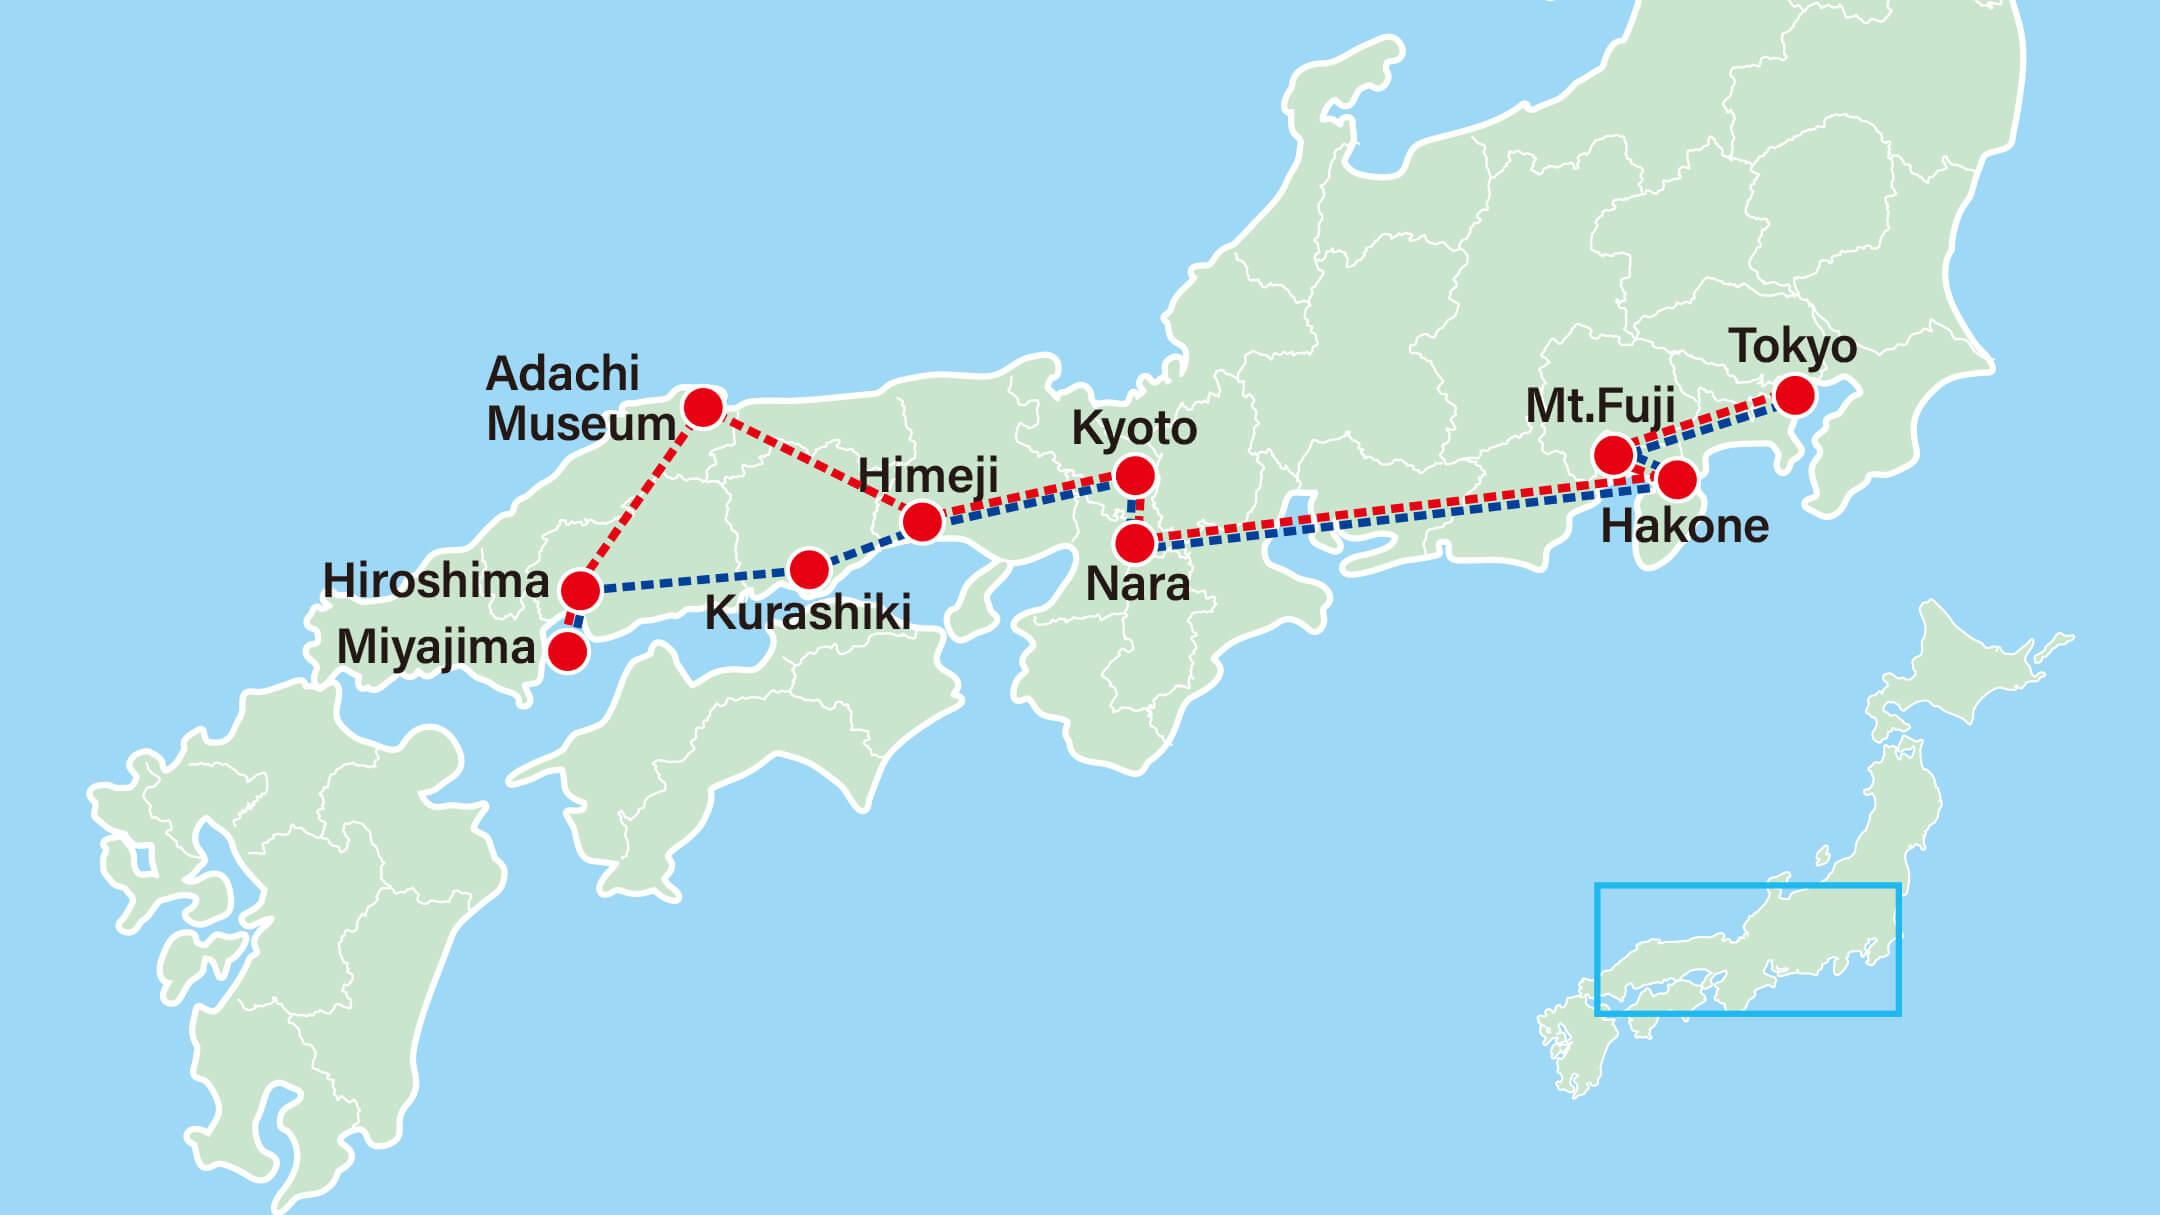 Highlights of Japan with Anime 10 Days -Tokyo-Mt. Fuji-Hakone-Nara-Kyoto-Himeji-Hiroshima-Miyajima